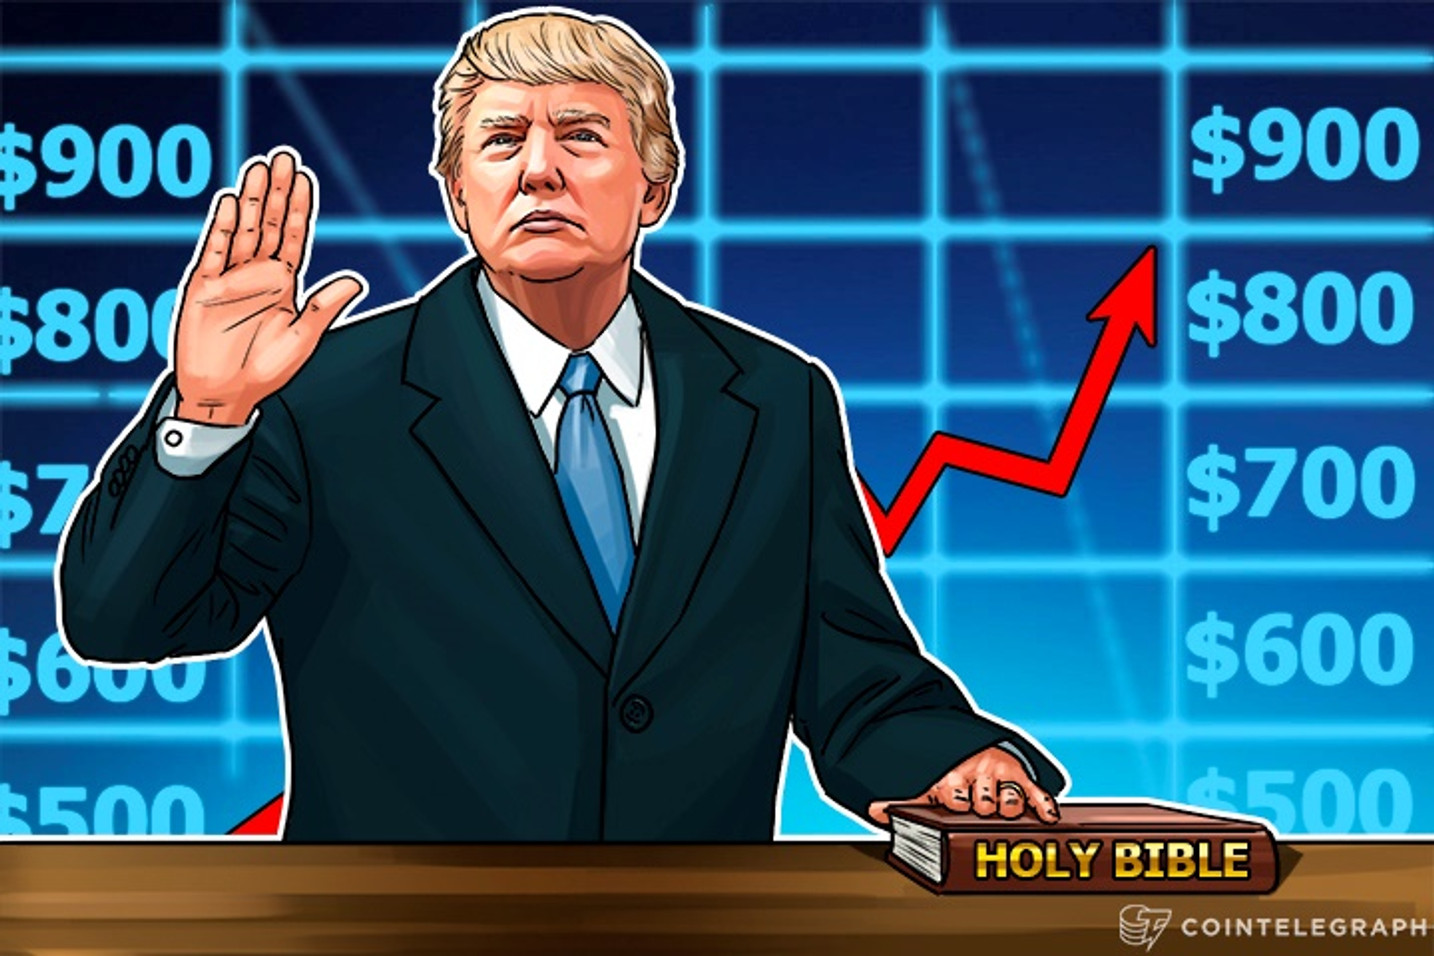 Bitcoin Price Nears $900 Days Before Trump's Swear-In; Monero, Dash, Steem Grow Too